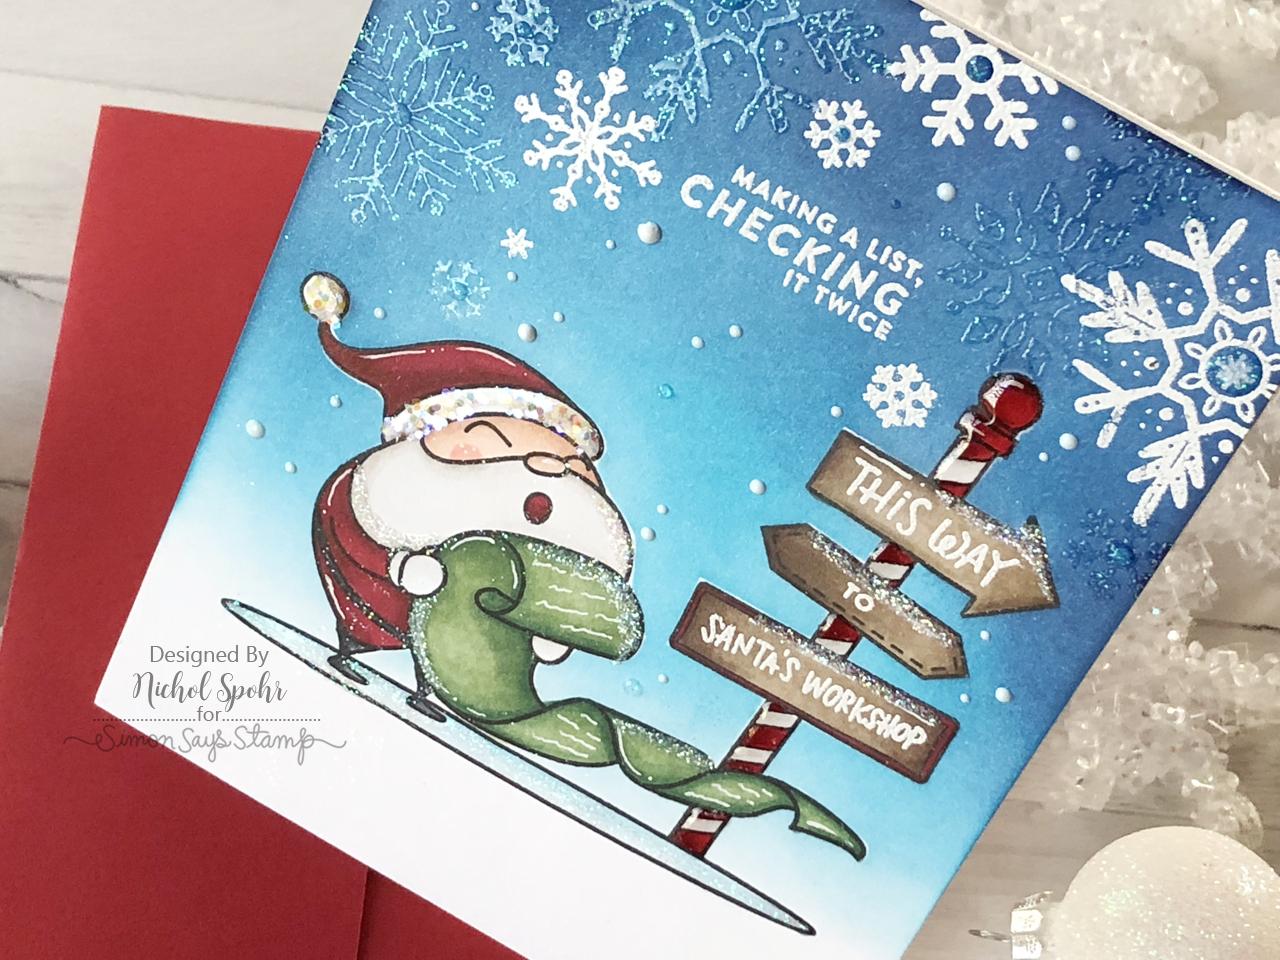 December 2018 Card Kit Inspiration